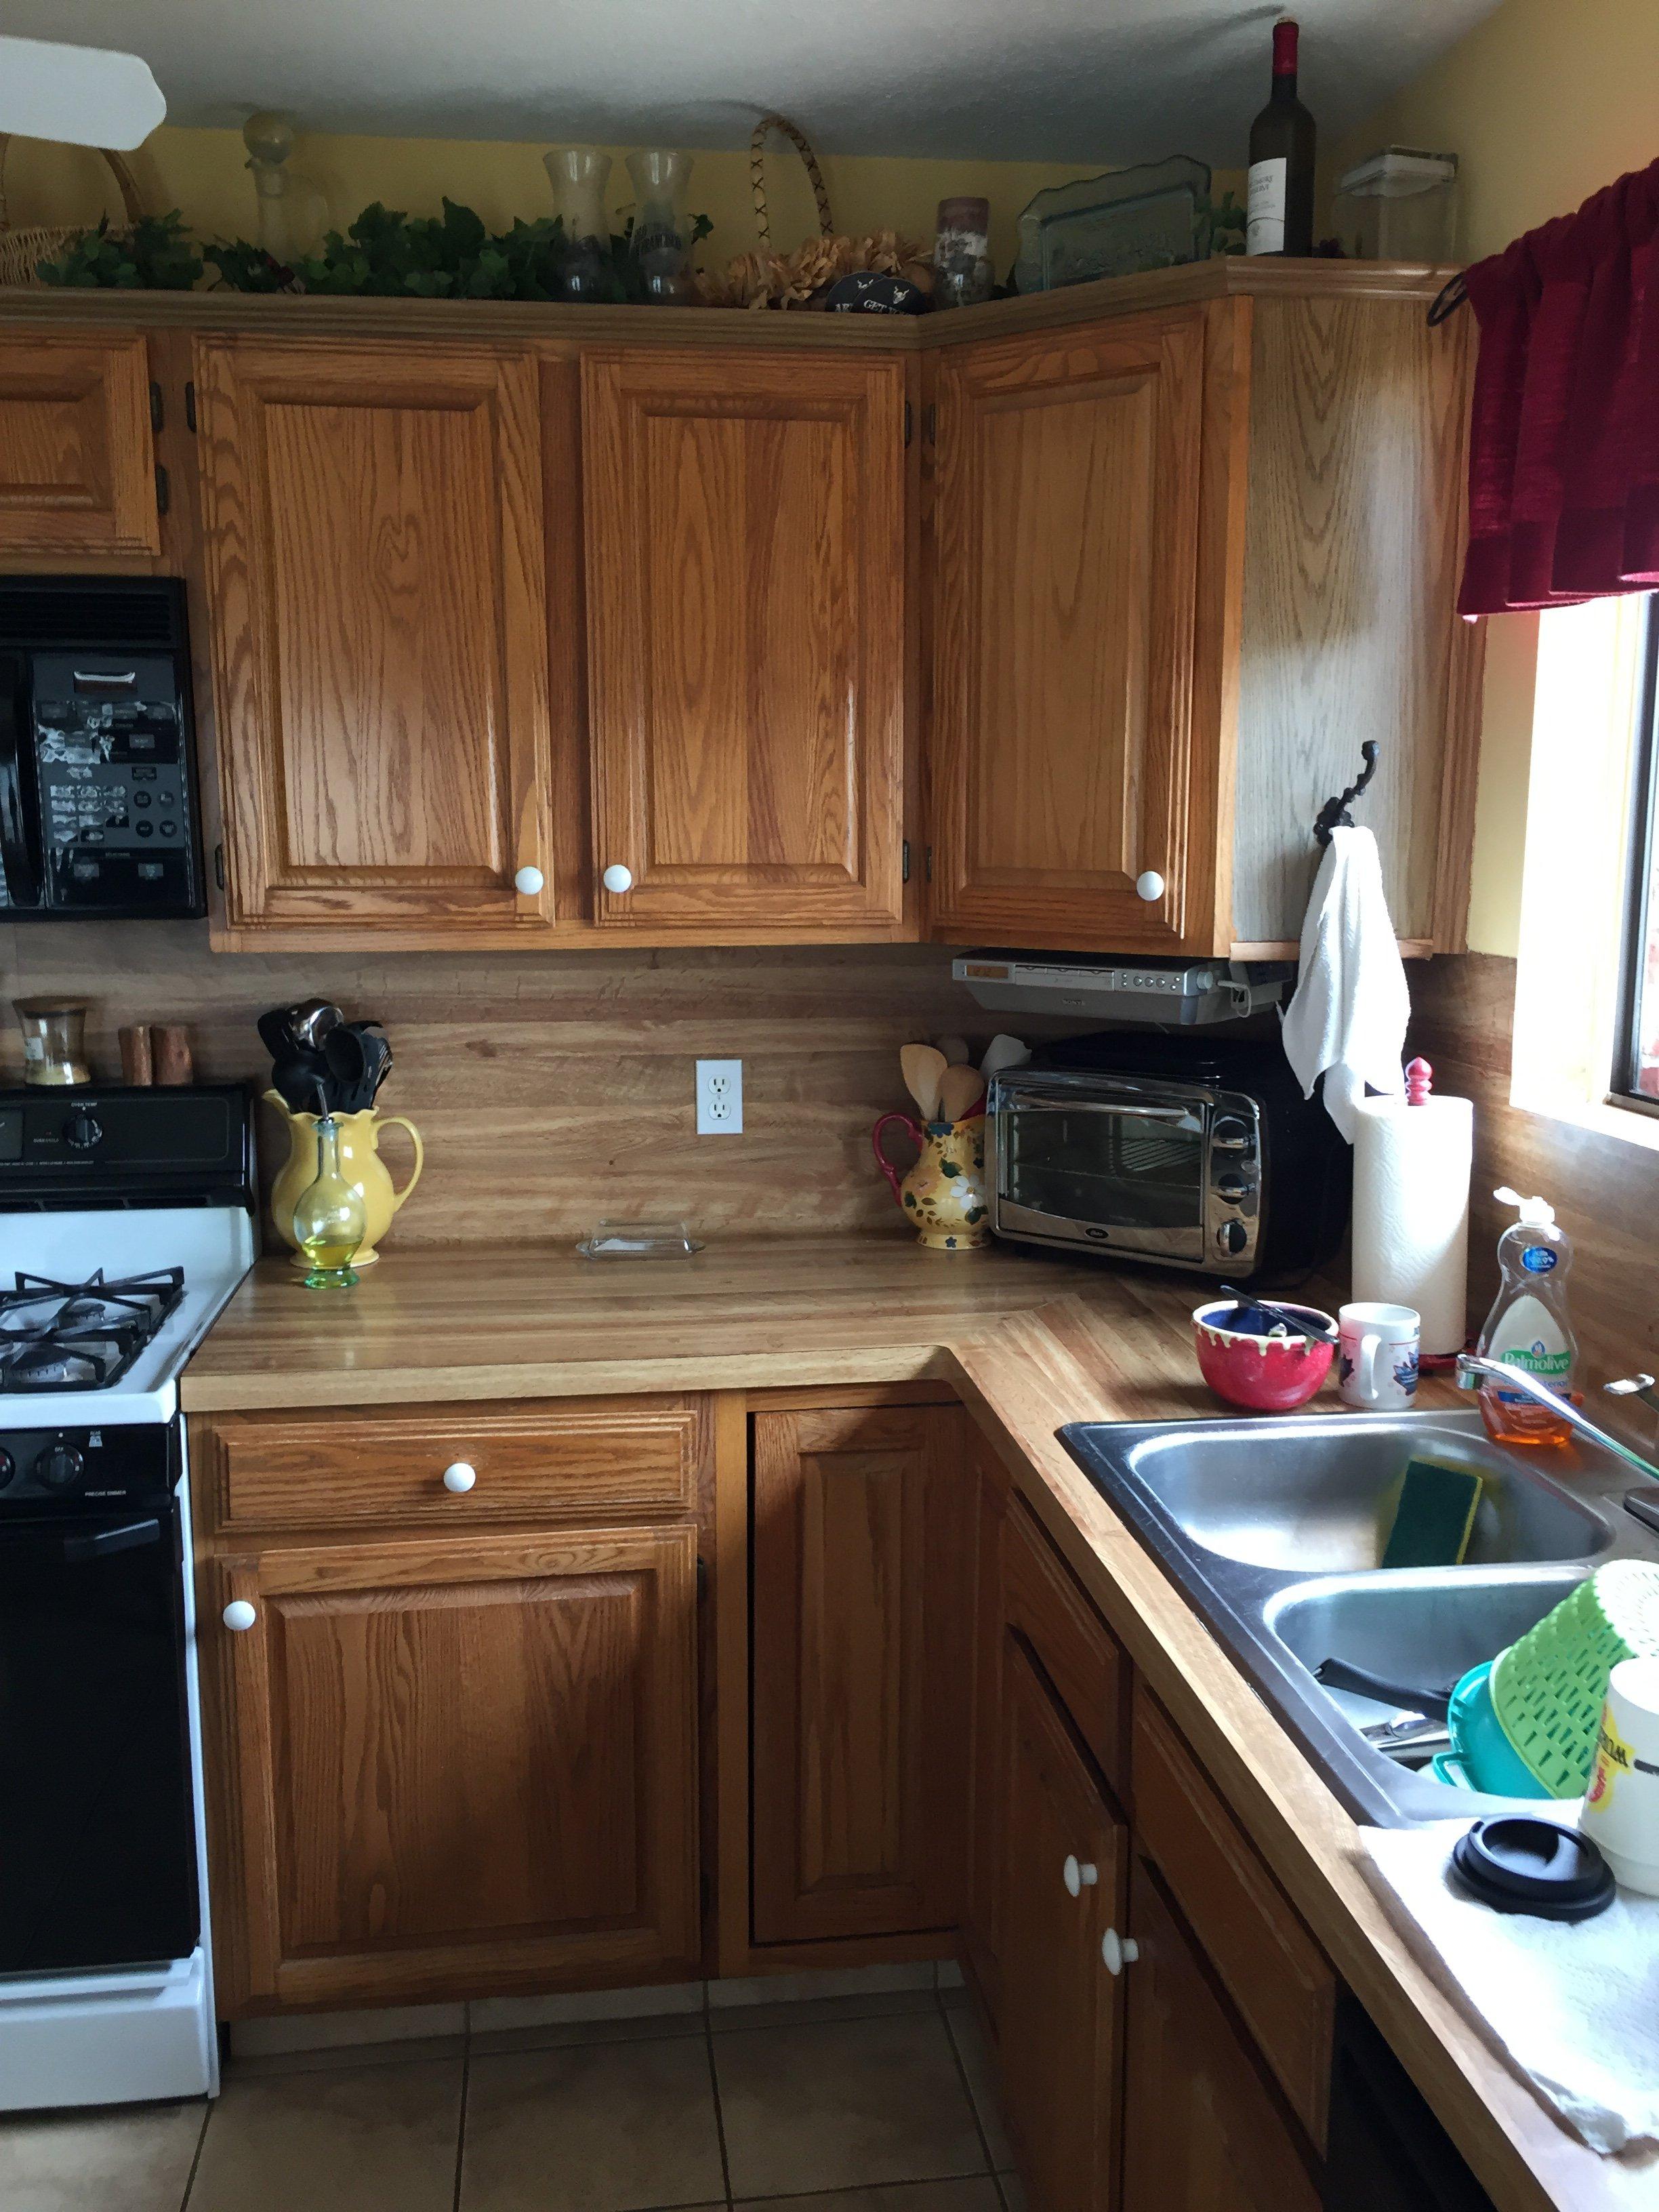 Kitchen countertops before